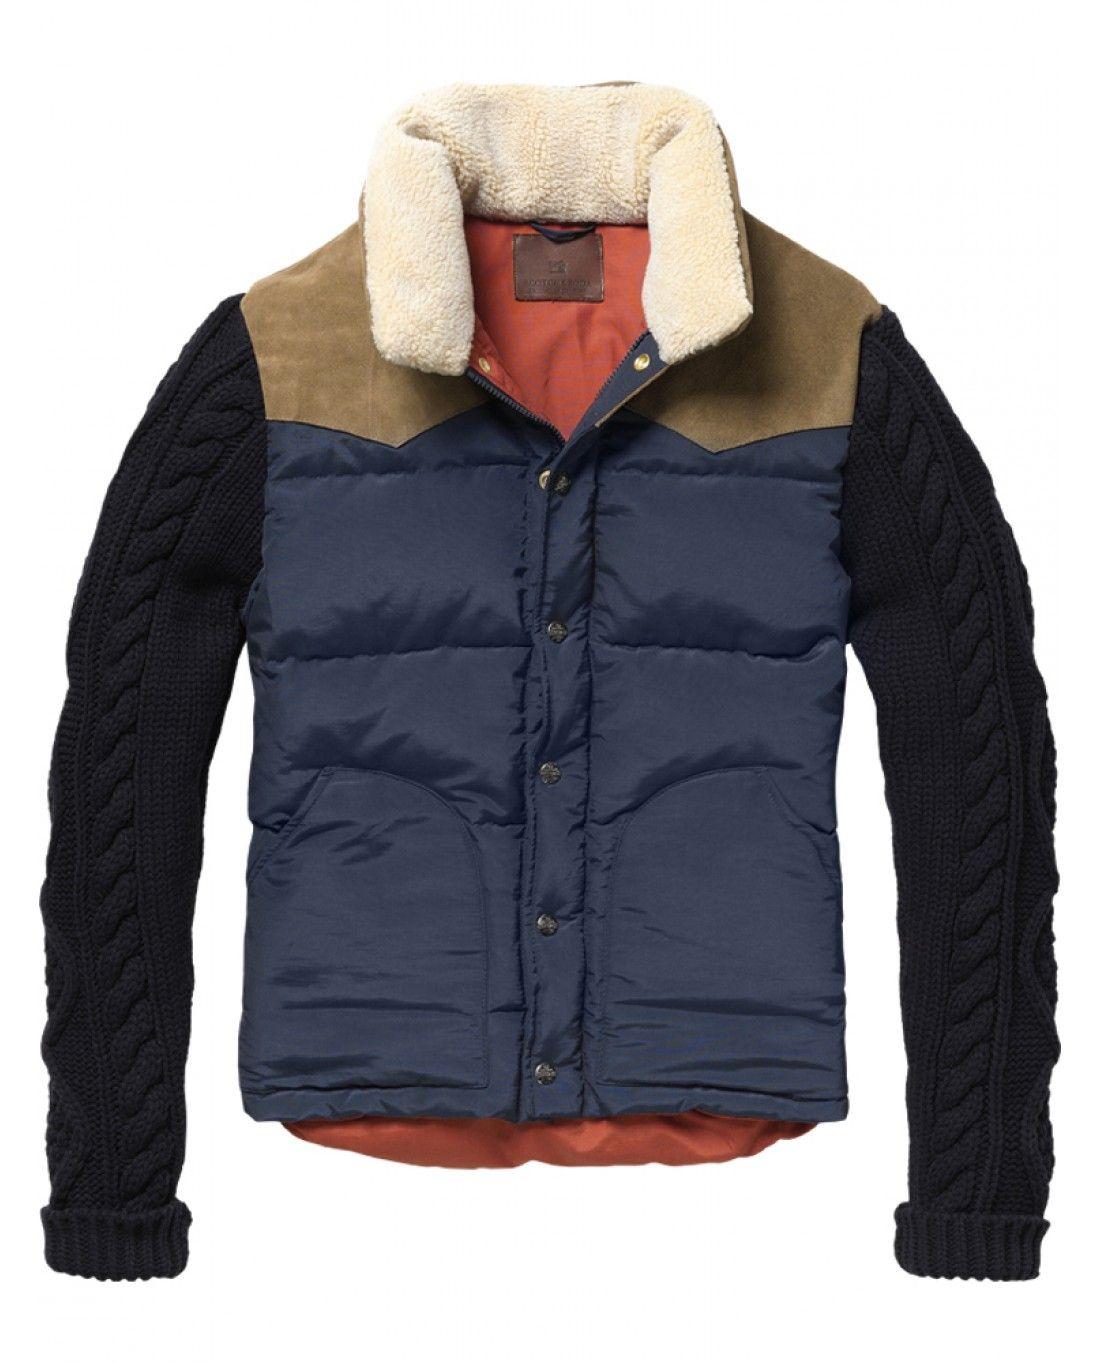 Knitted sleeved body warmer - Inbetweens - Scotch & Soda Online Shop